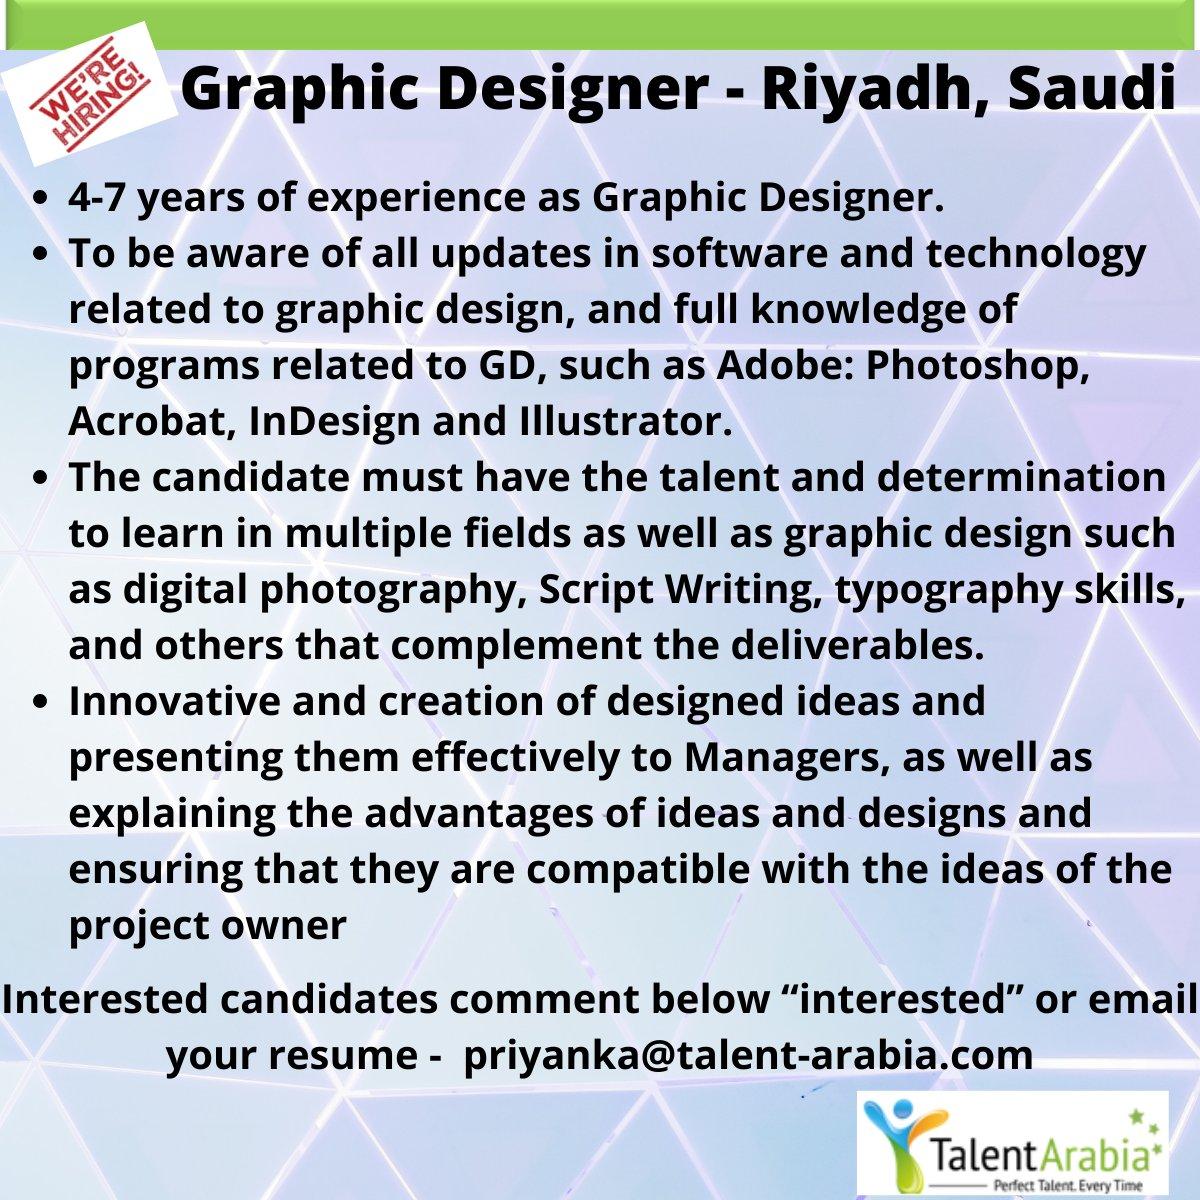 #immediatehiring for Graphic Designer with our client in Riyadh,Saudi  Please share resume https://t.co/sBgbQDdZB2 OR priyanka@talent-arabia.com  #talentarabia #perfecttalenteverytime #photoshop #illustrator #graphicdesigner https://t.co/6zIm0PYUvp